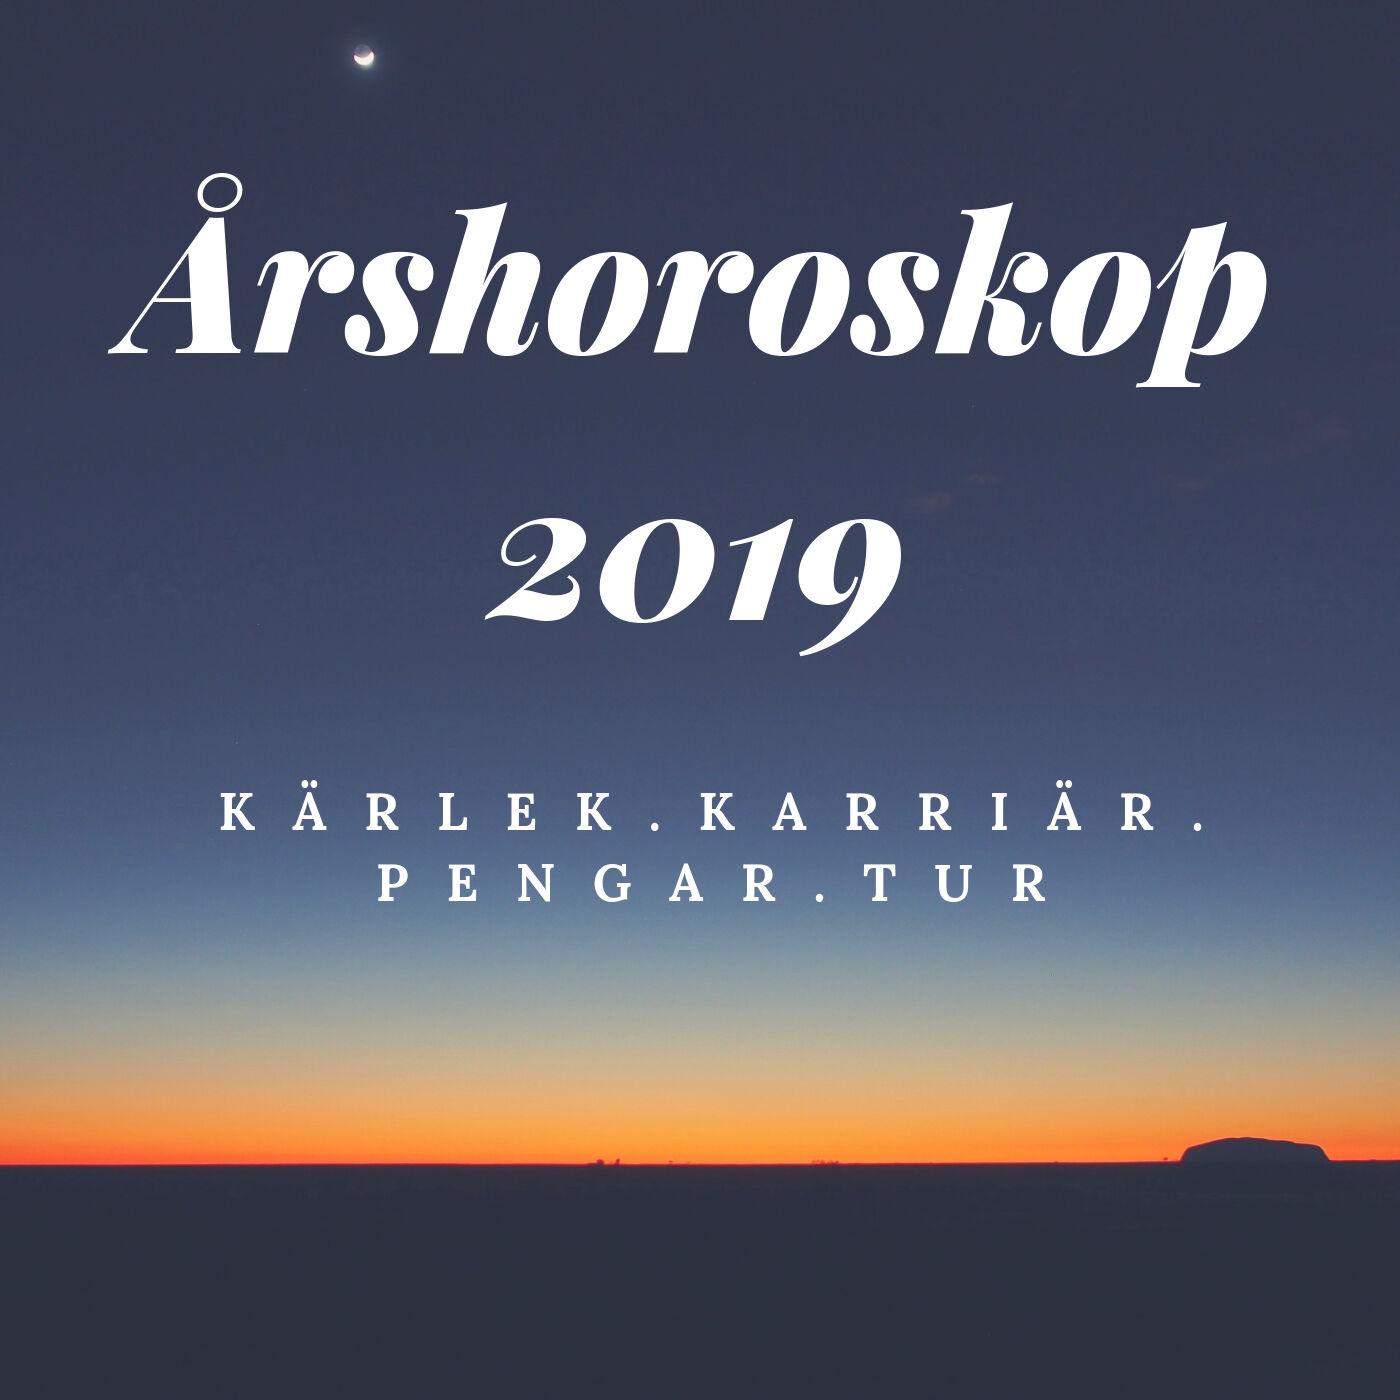 rshoroskop_final_2019